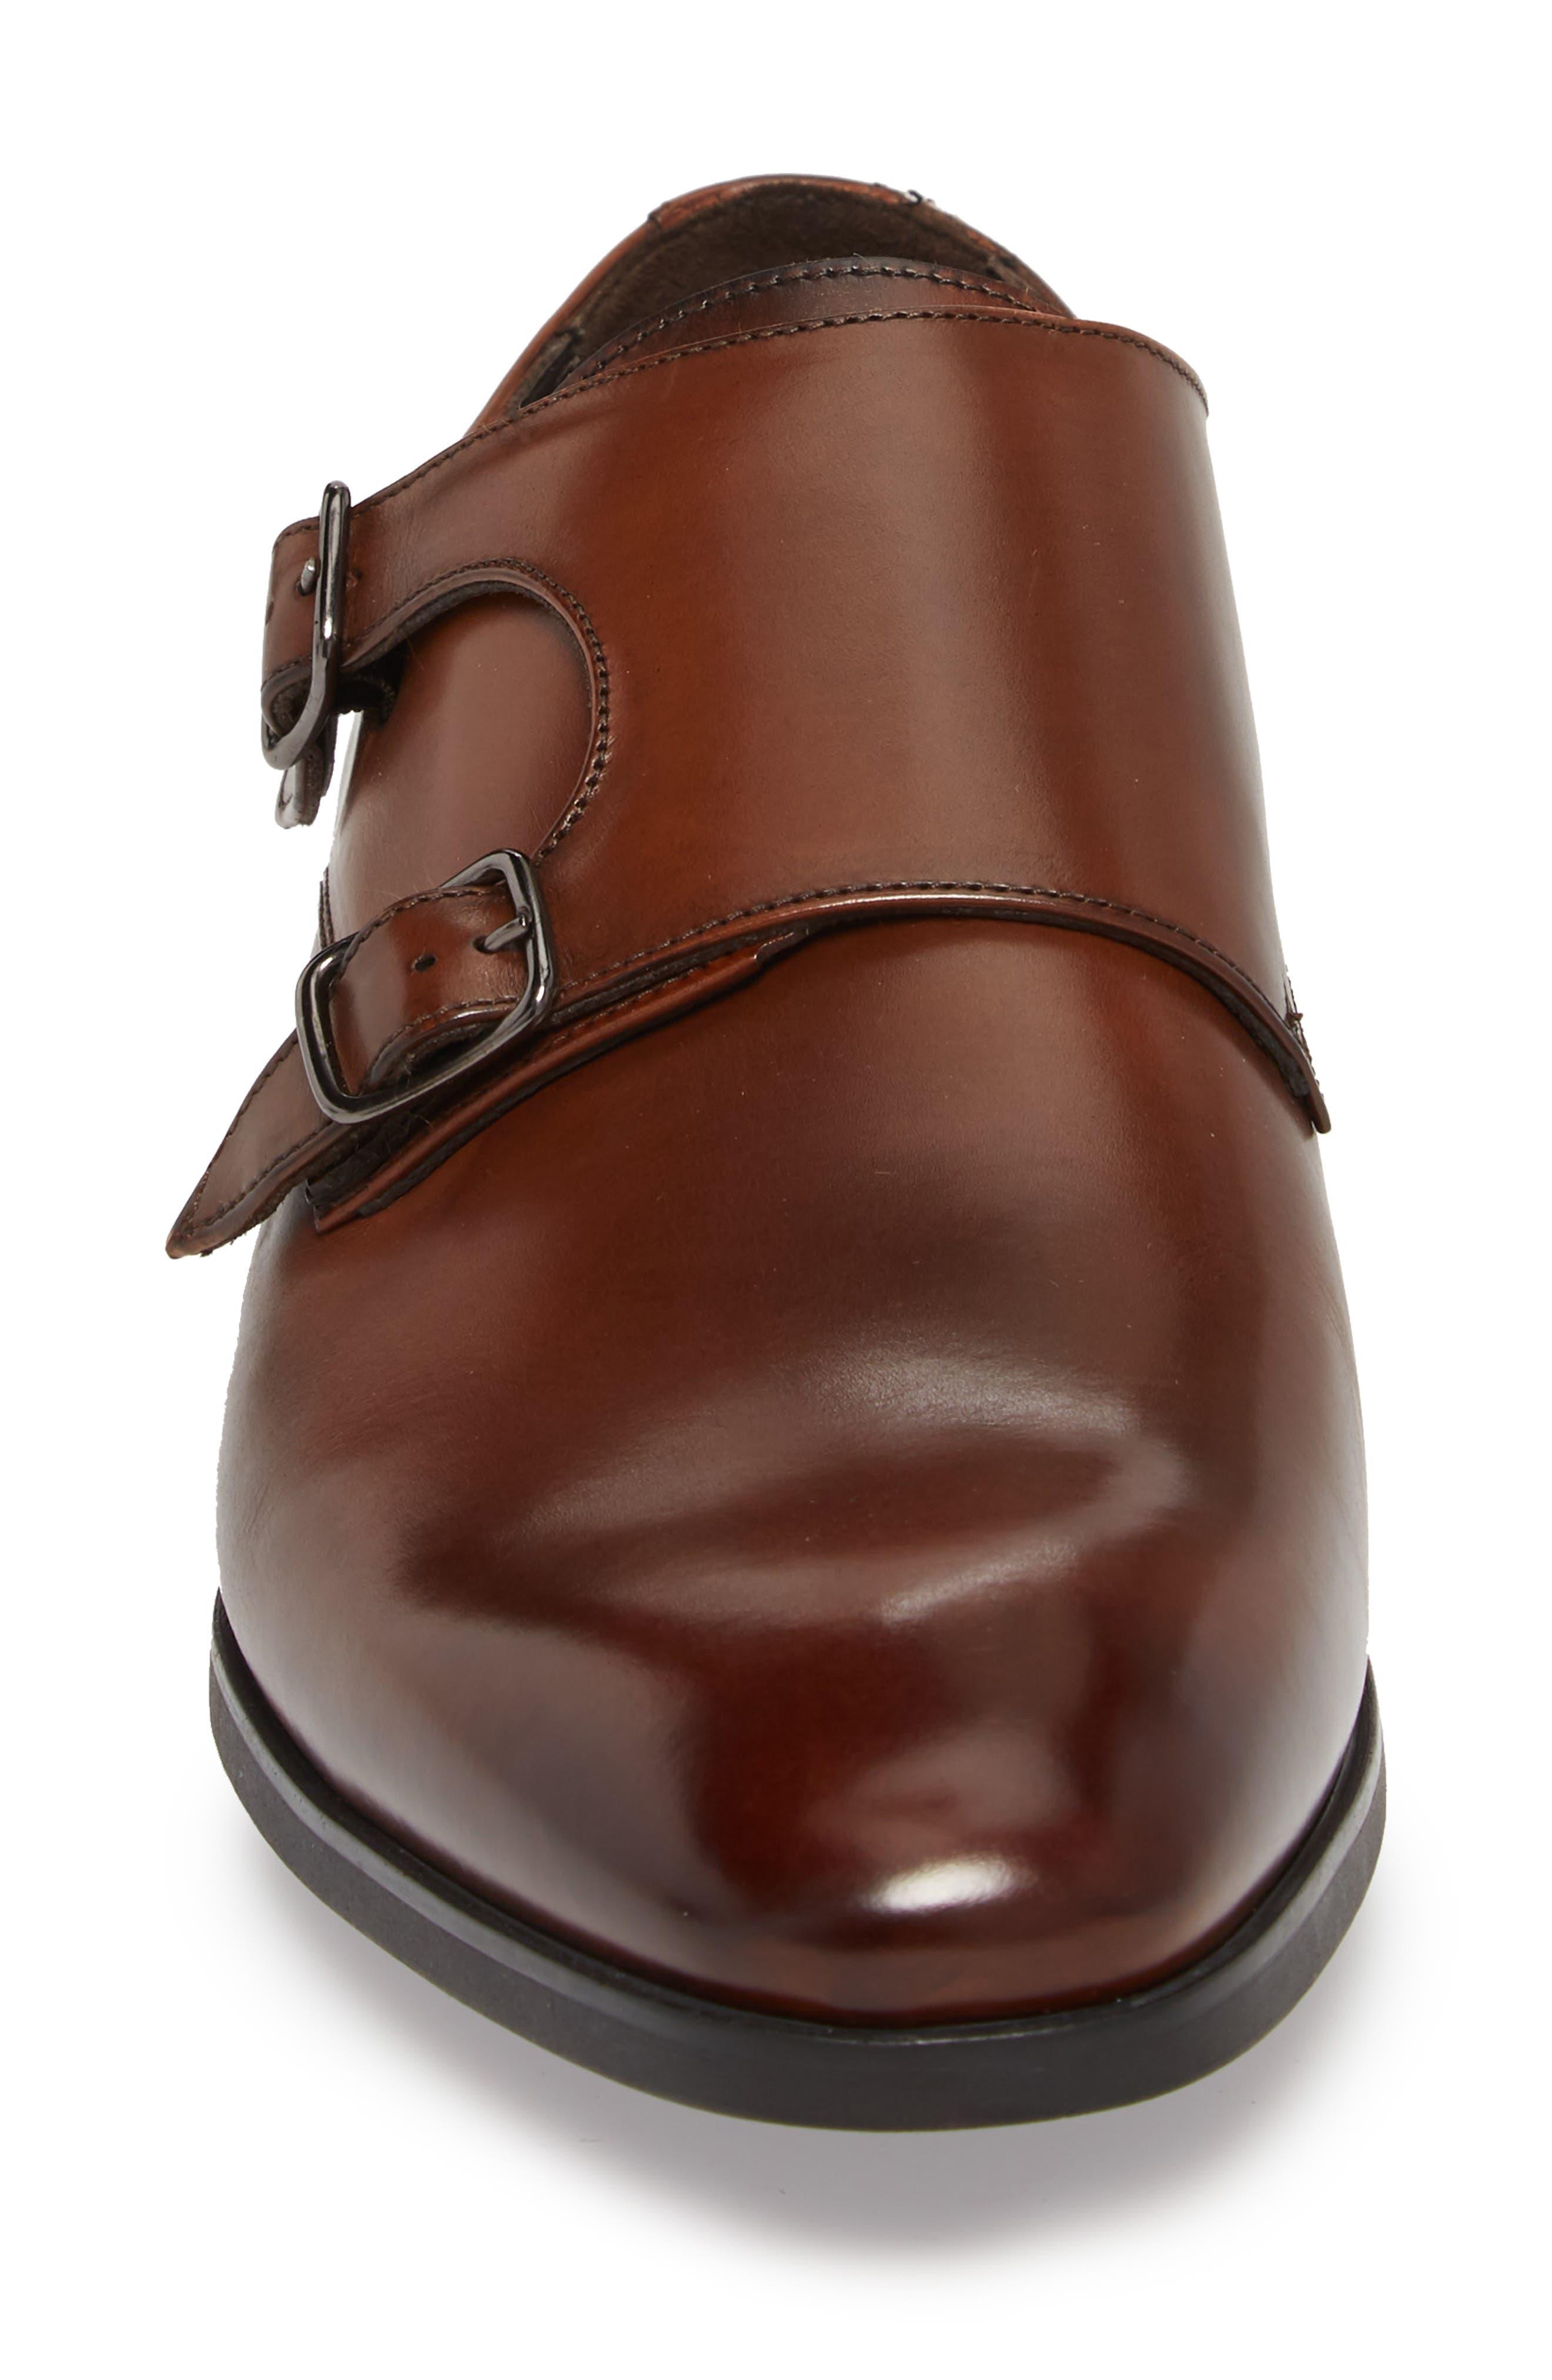 Benjamin Double Monk Strap Shoe,                             Alternate thumbnail 4, color,                             TMORO LEATHER